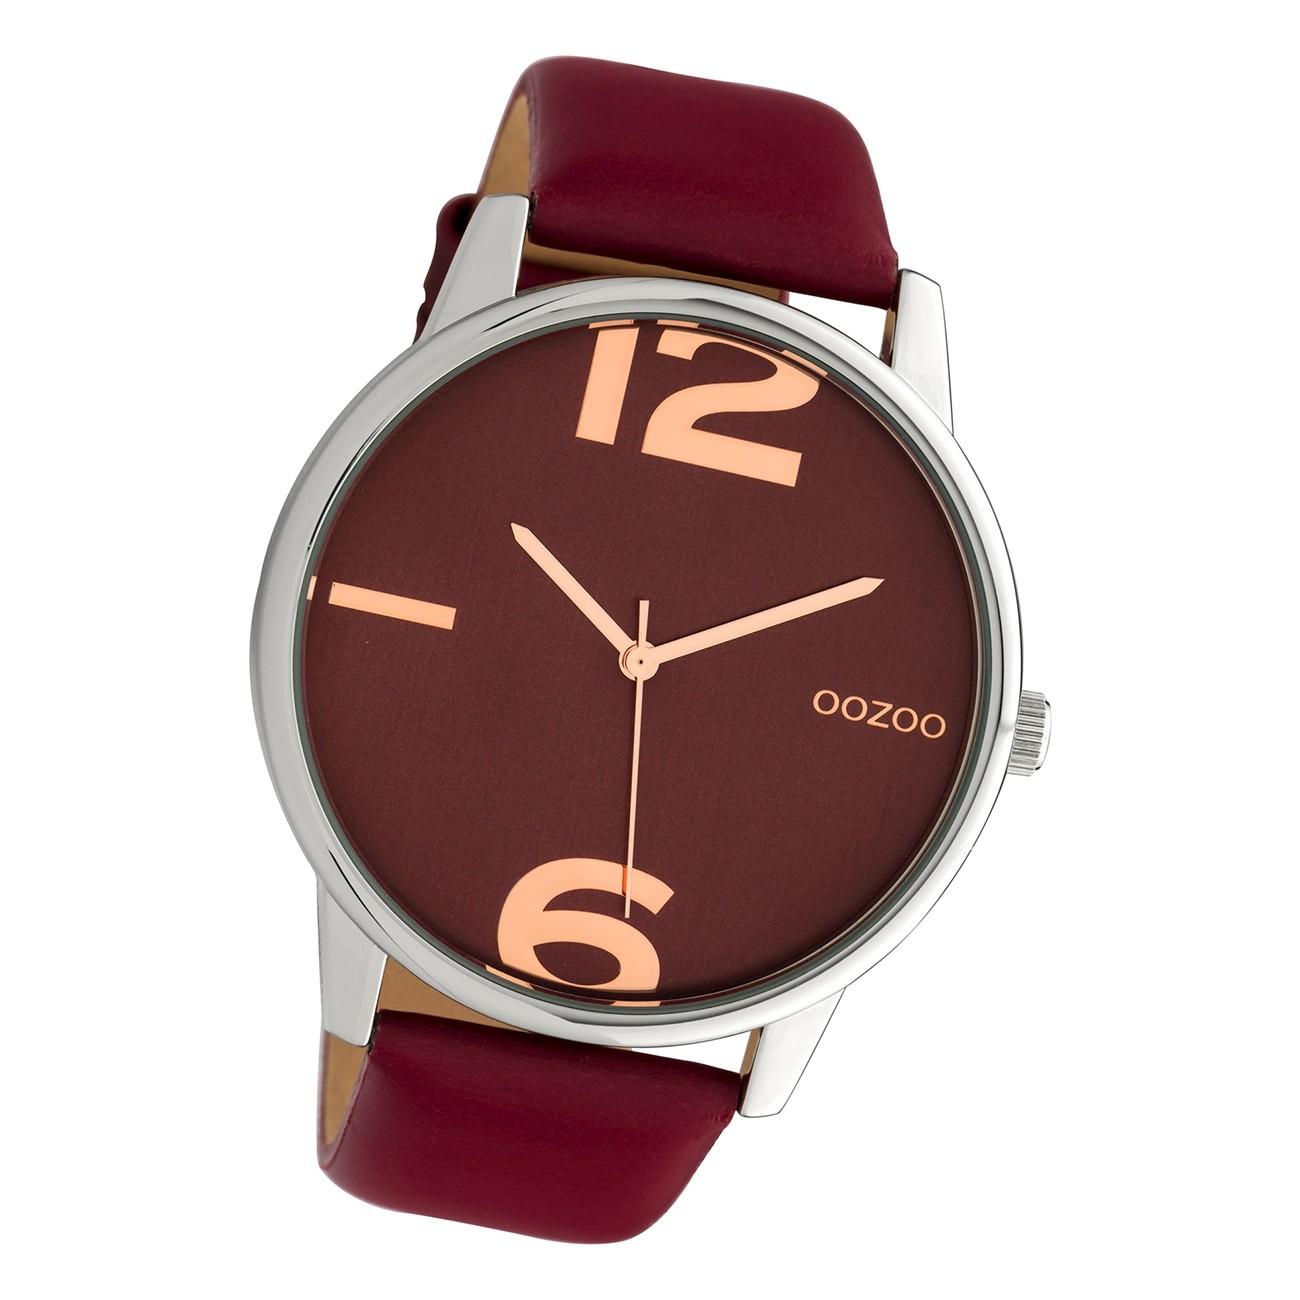 Oozoo Damen Armbanduhr Timepieces C10373 Analog Leder weinrot UOC10373